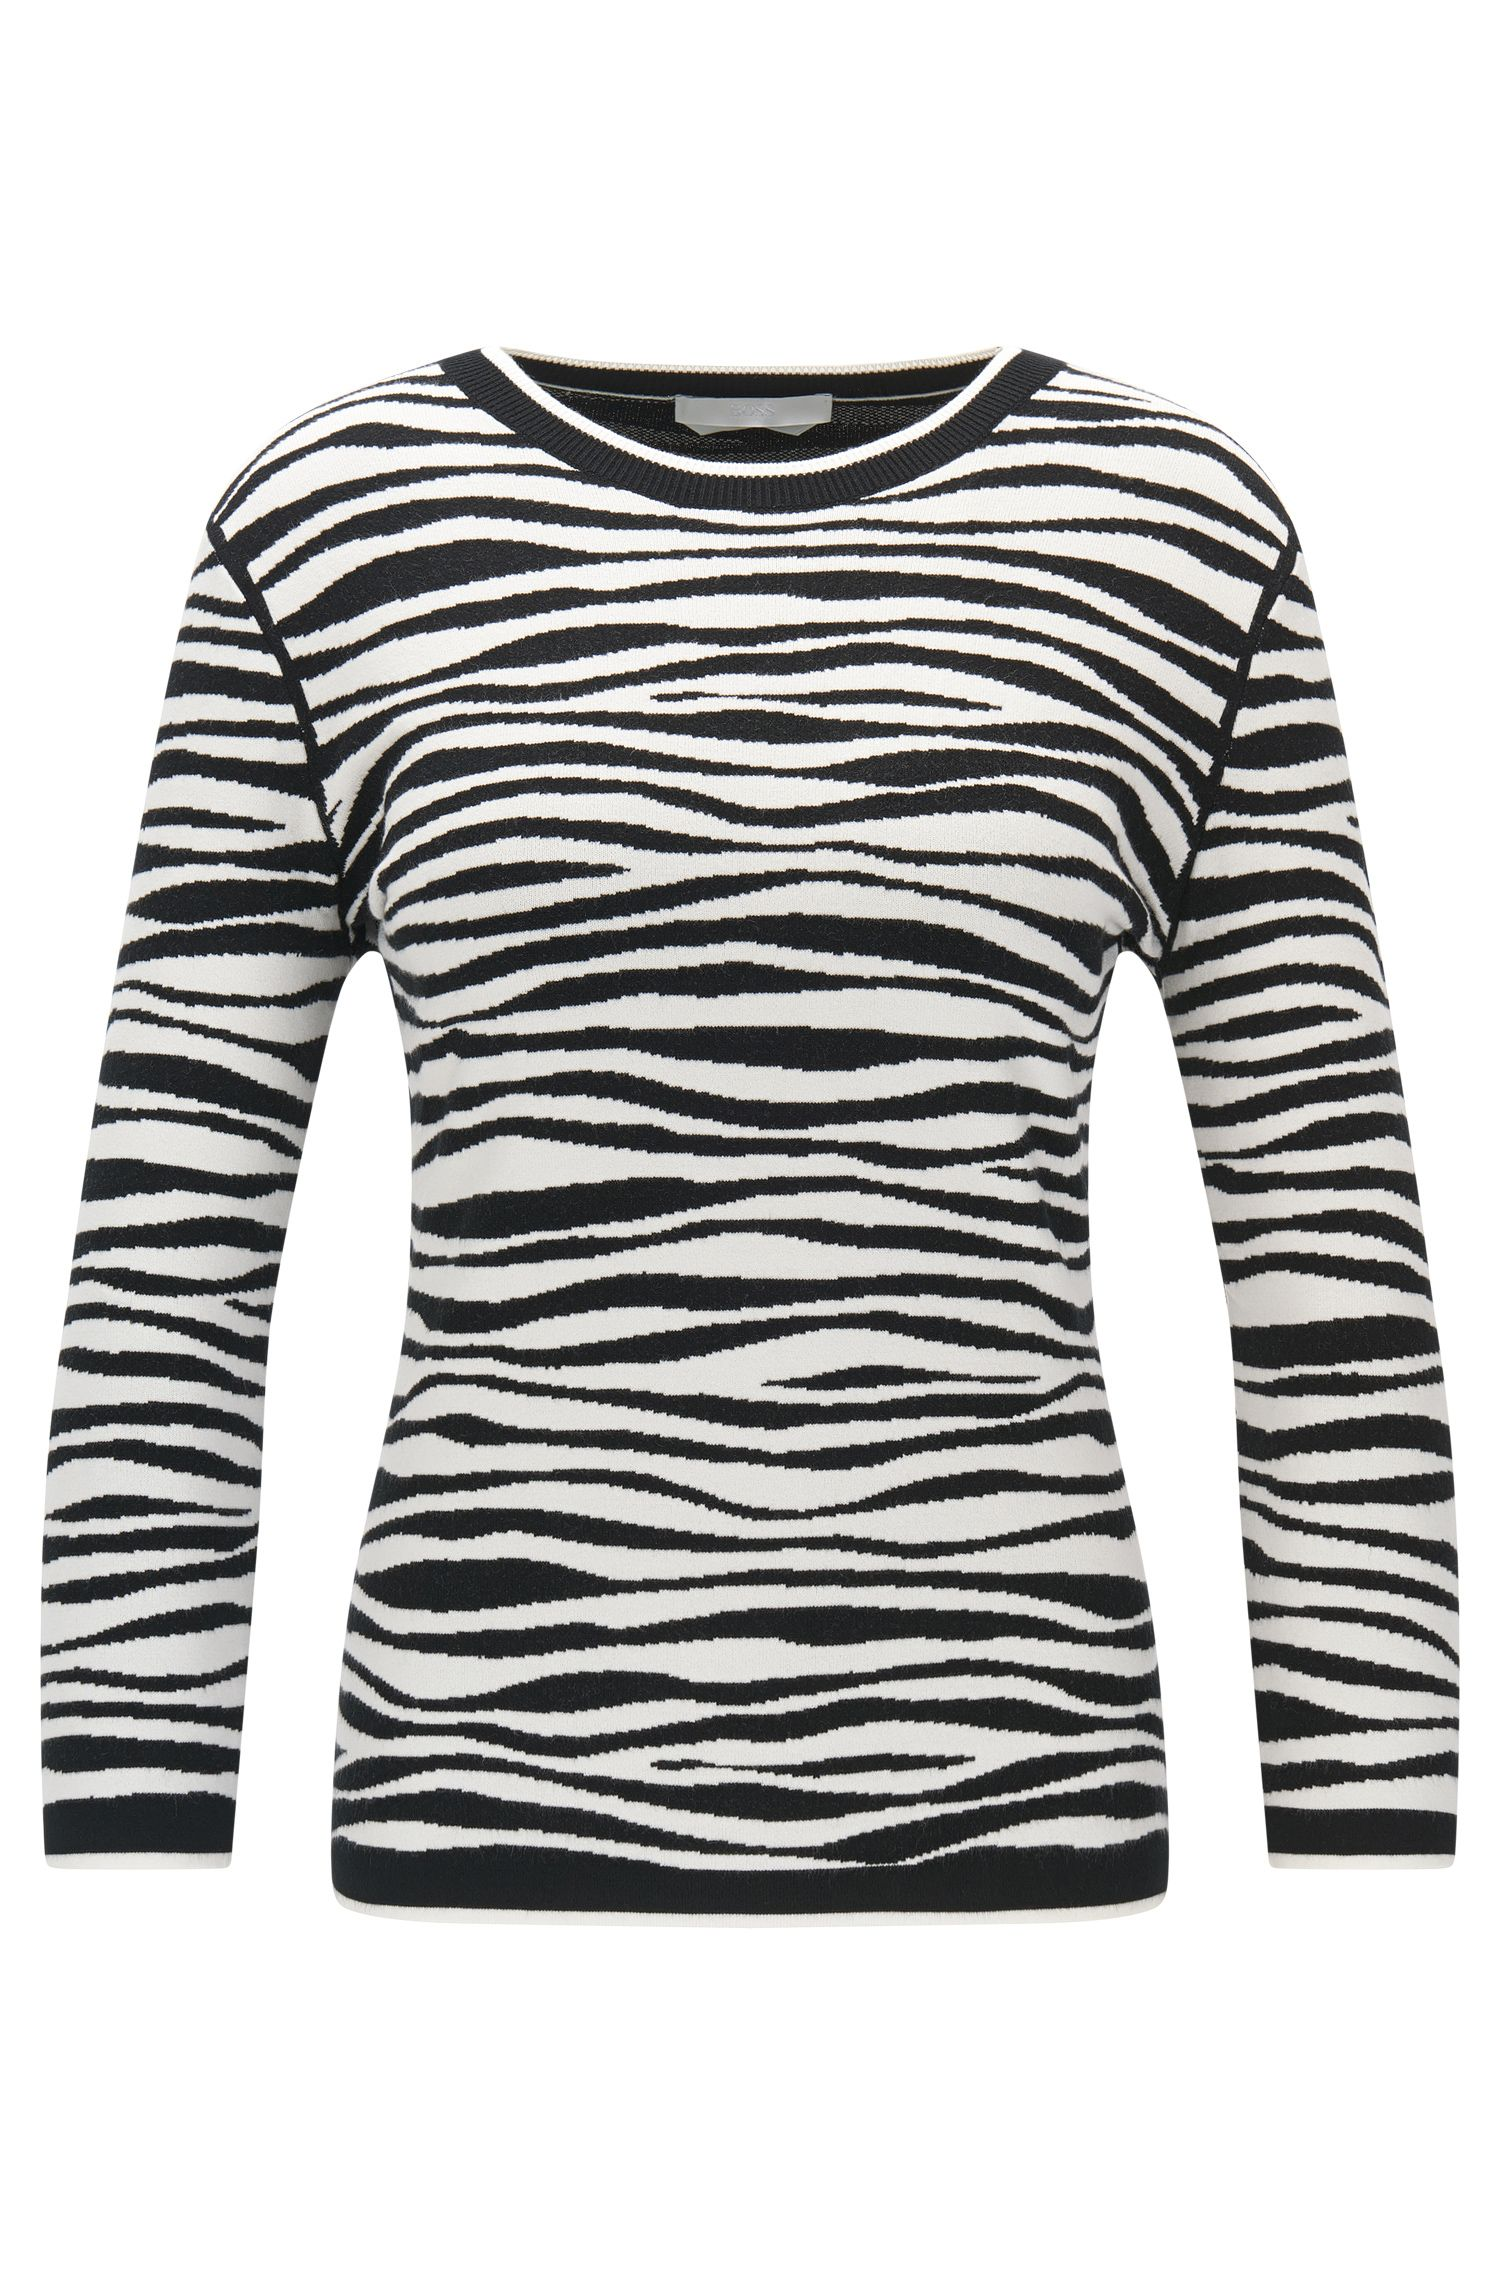 Zebra-stripe sweater in soft jacquard